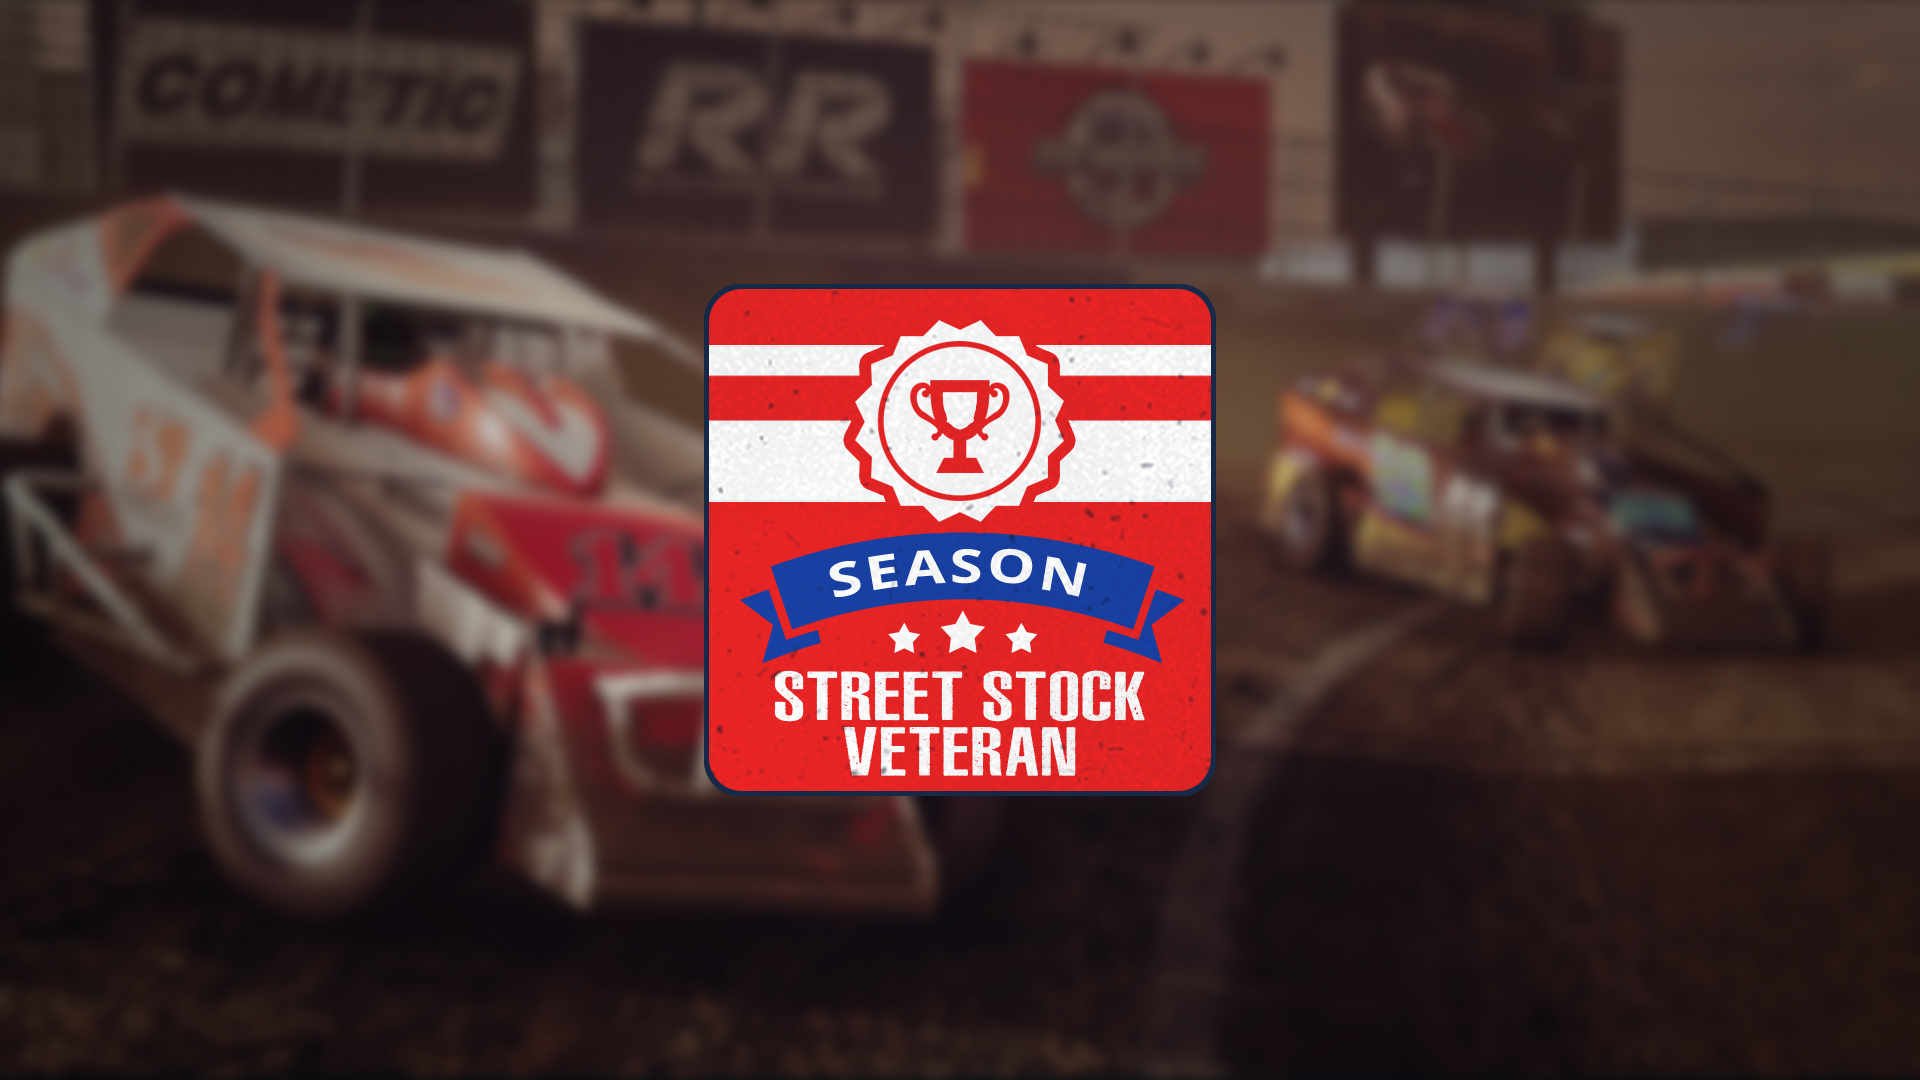 Street Stock Veteran